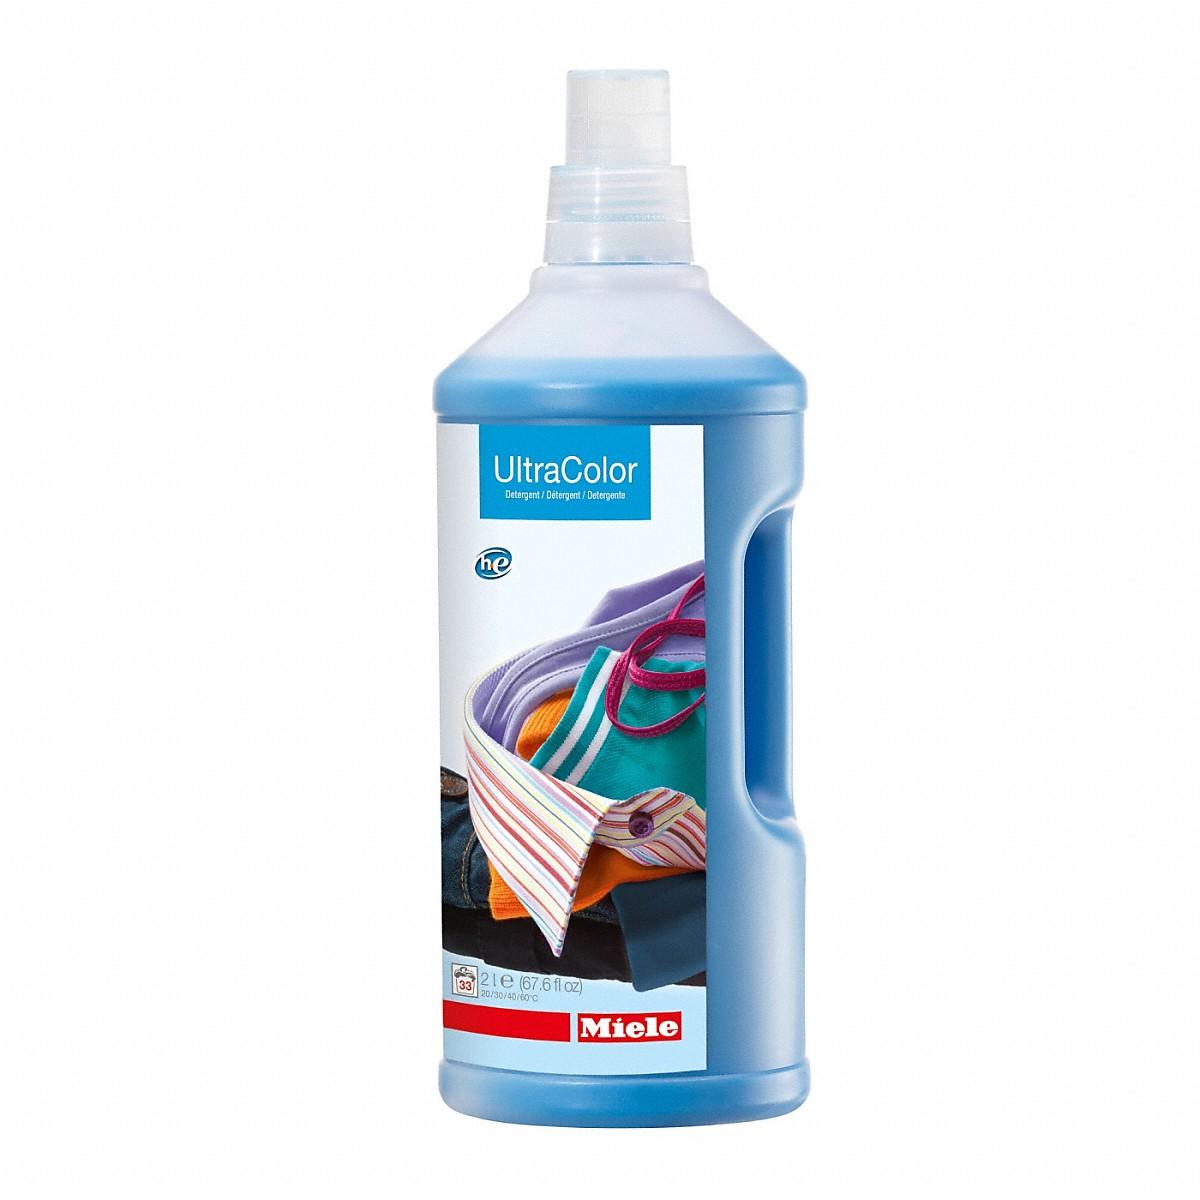 UltraColor liquid detergent 67.6 fl. oz. for color and black garments.